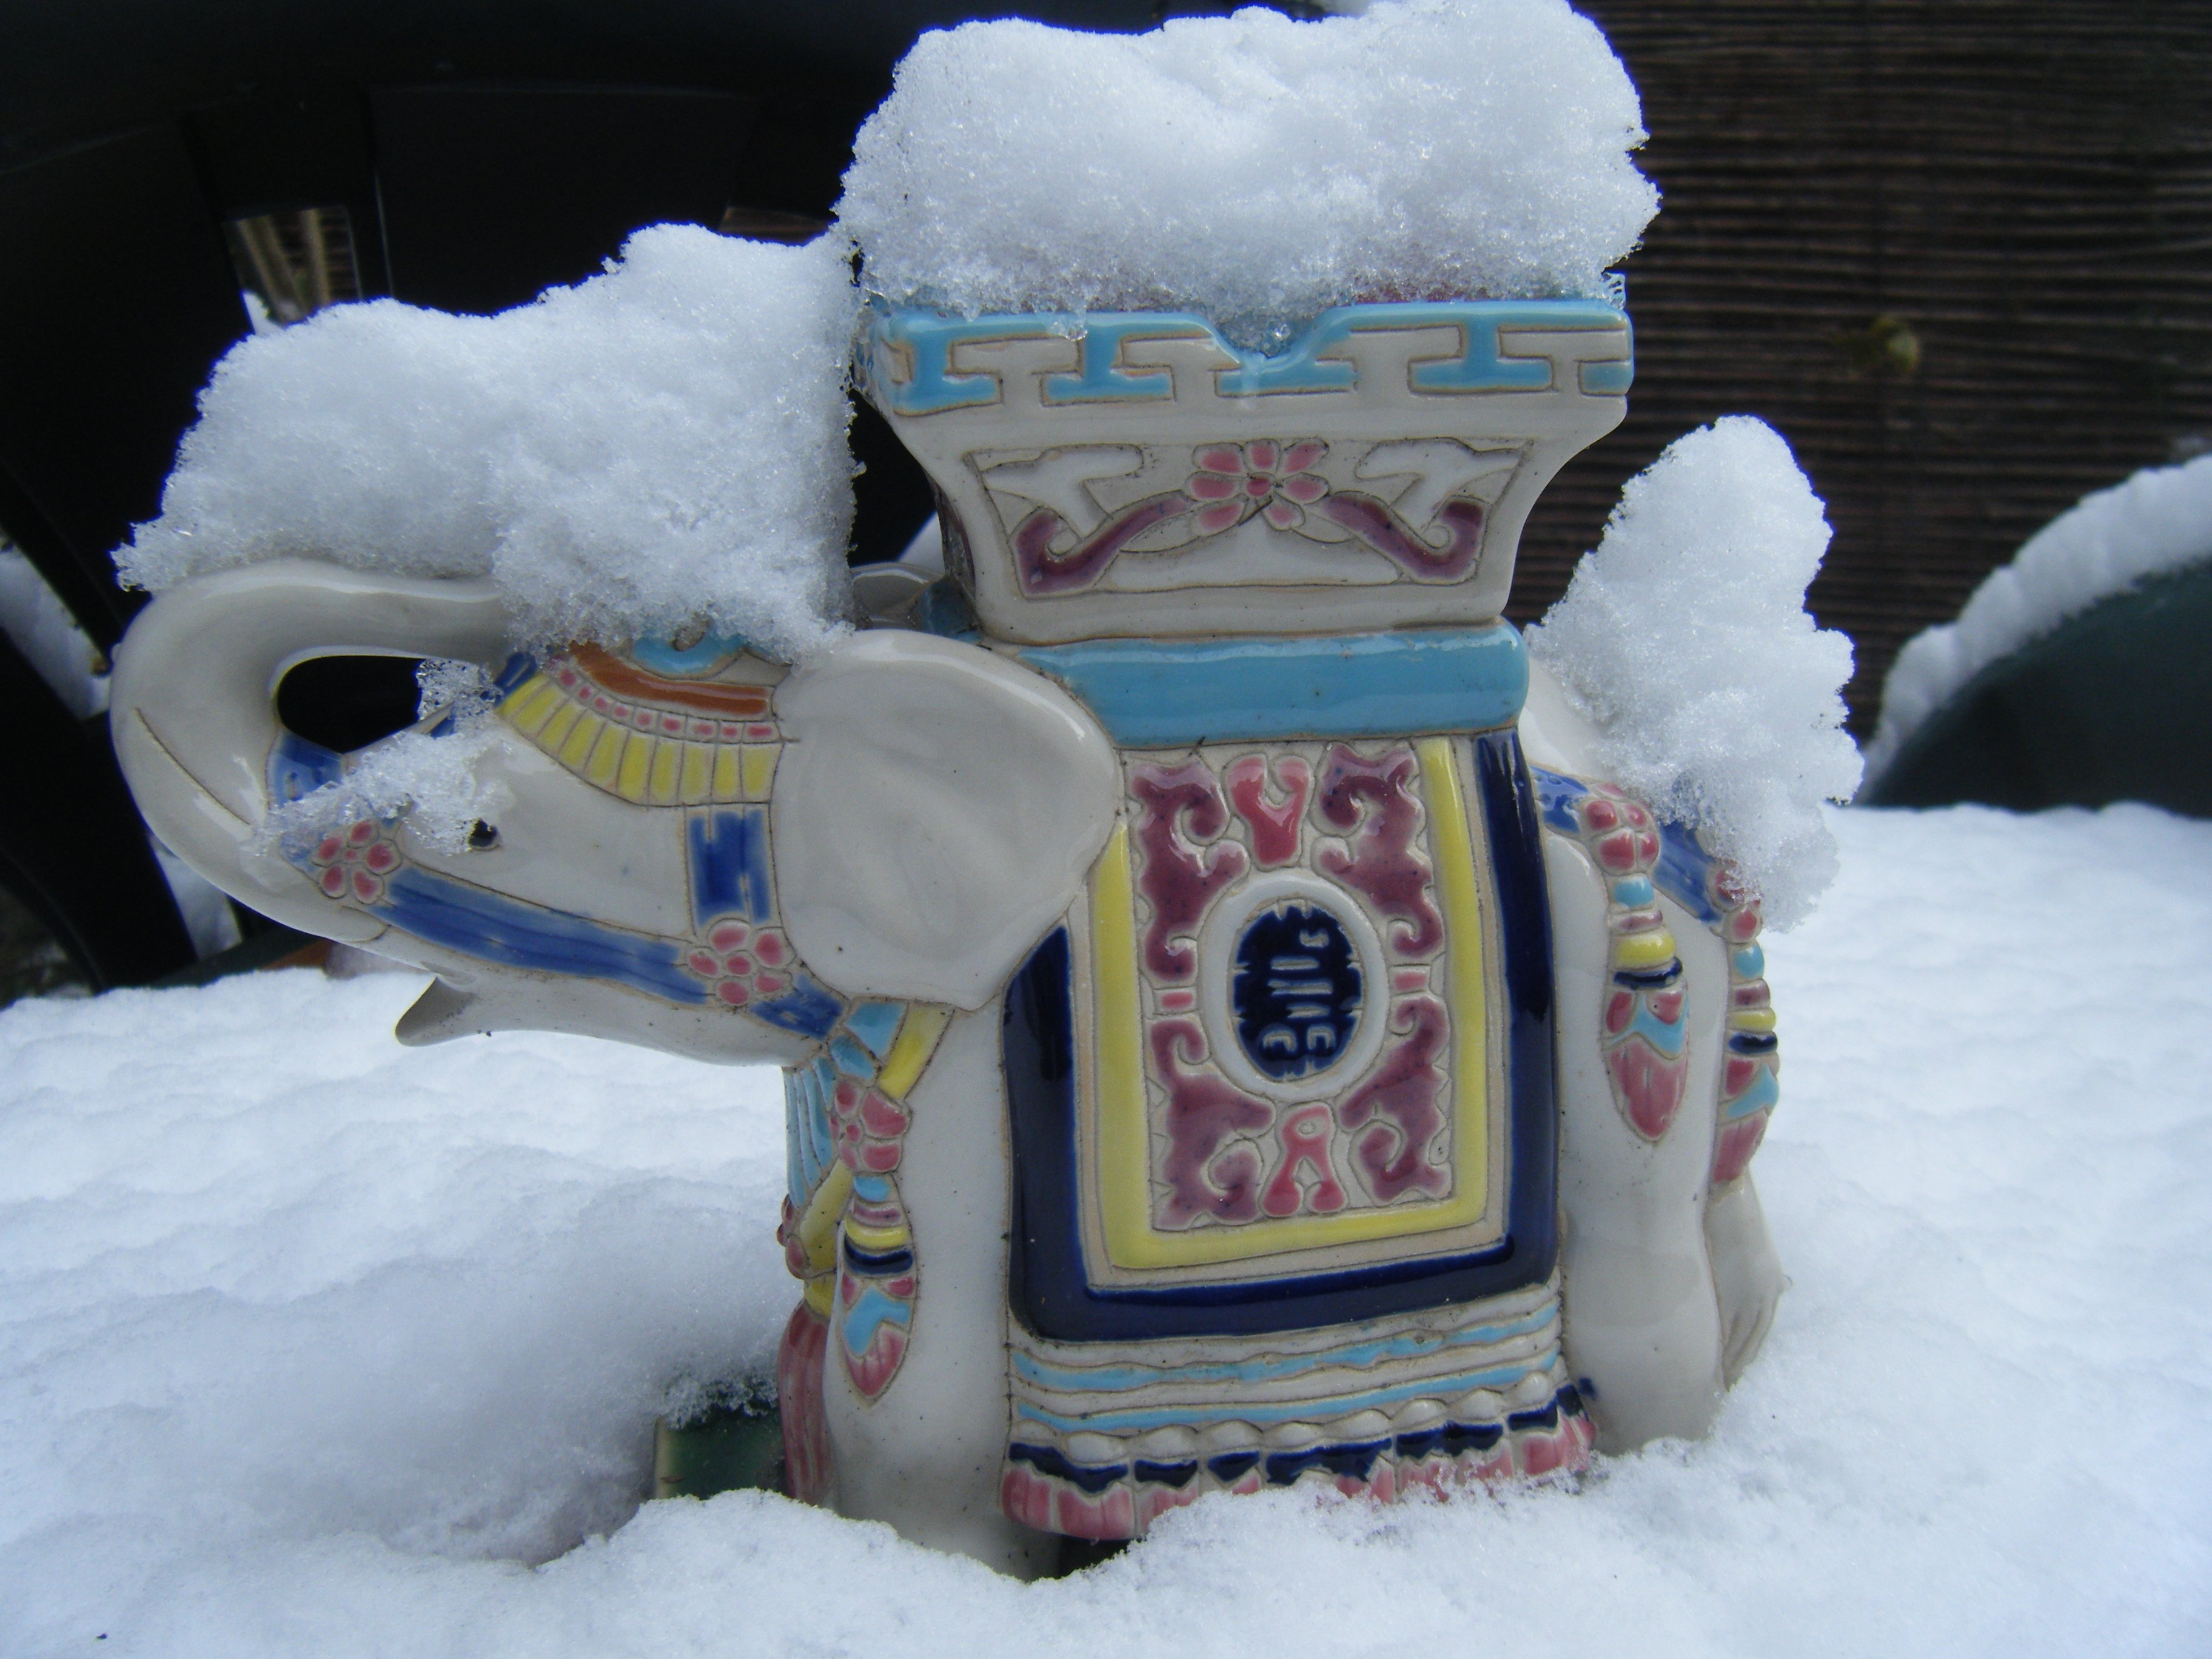 neige2010018.jpg